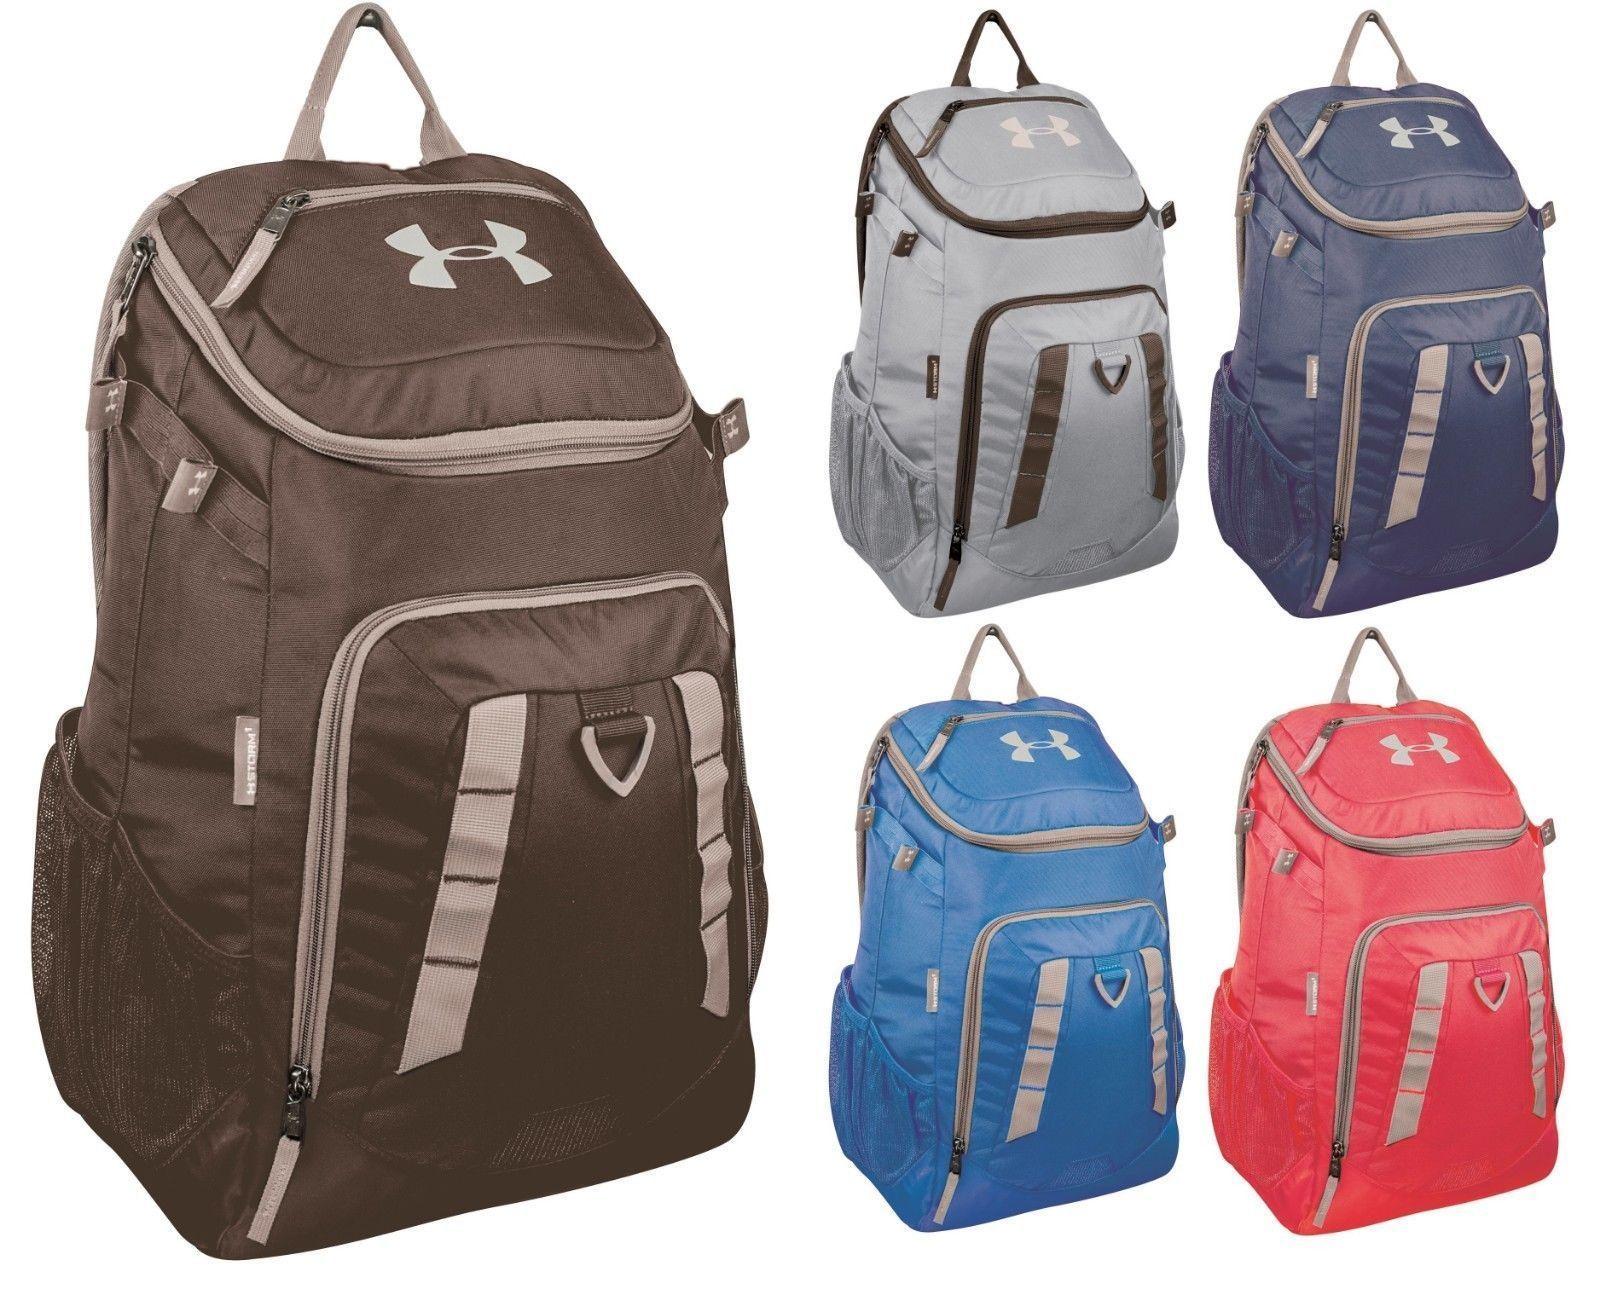 super popular 12316 53ef4 Equipment Bags 50807  Under Armour Ua Undeniable Baseball Softball Bat  Backpack Bag Uasb-Ubp